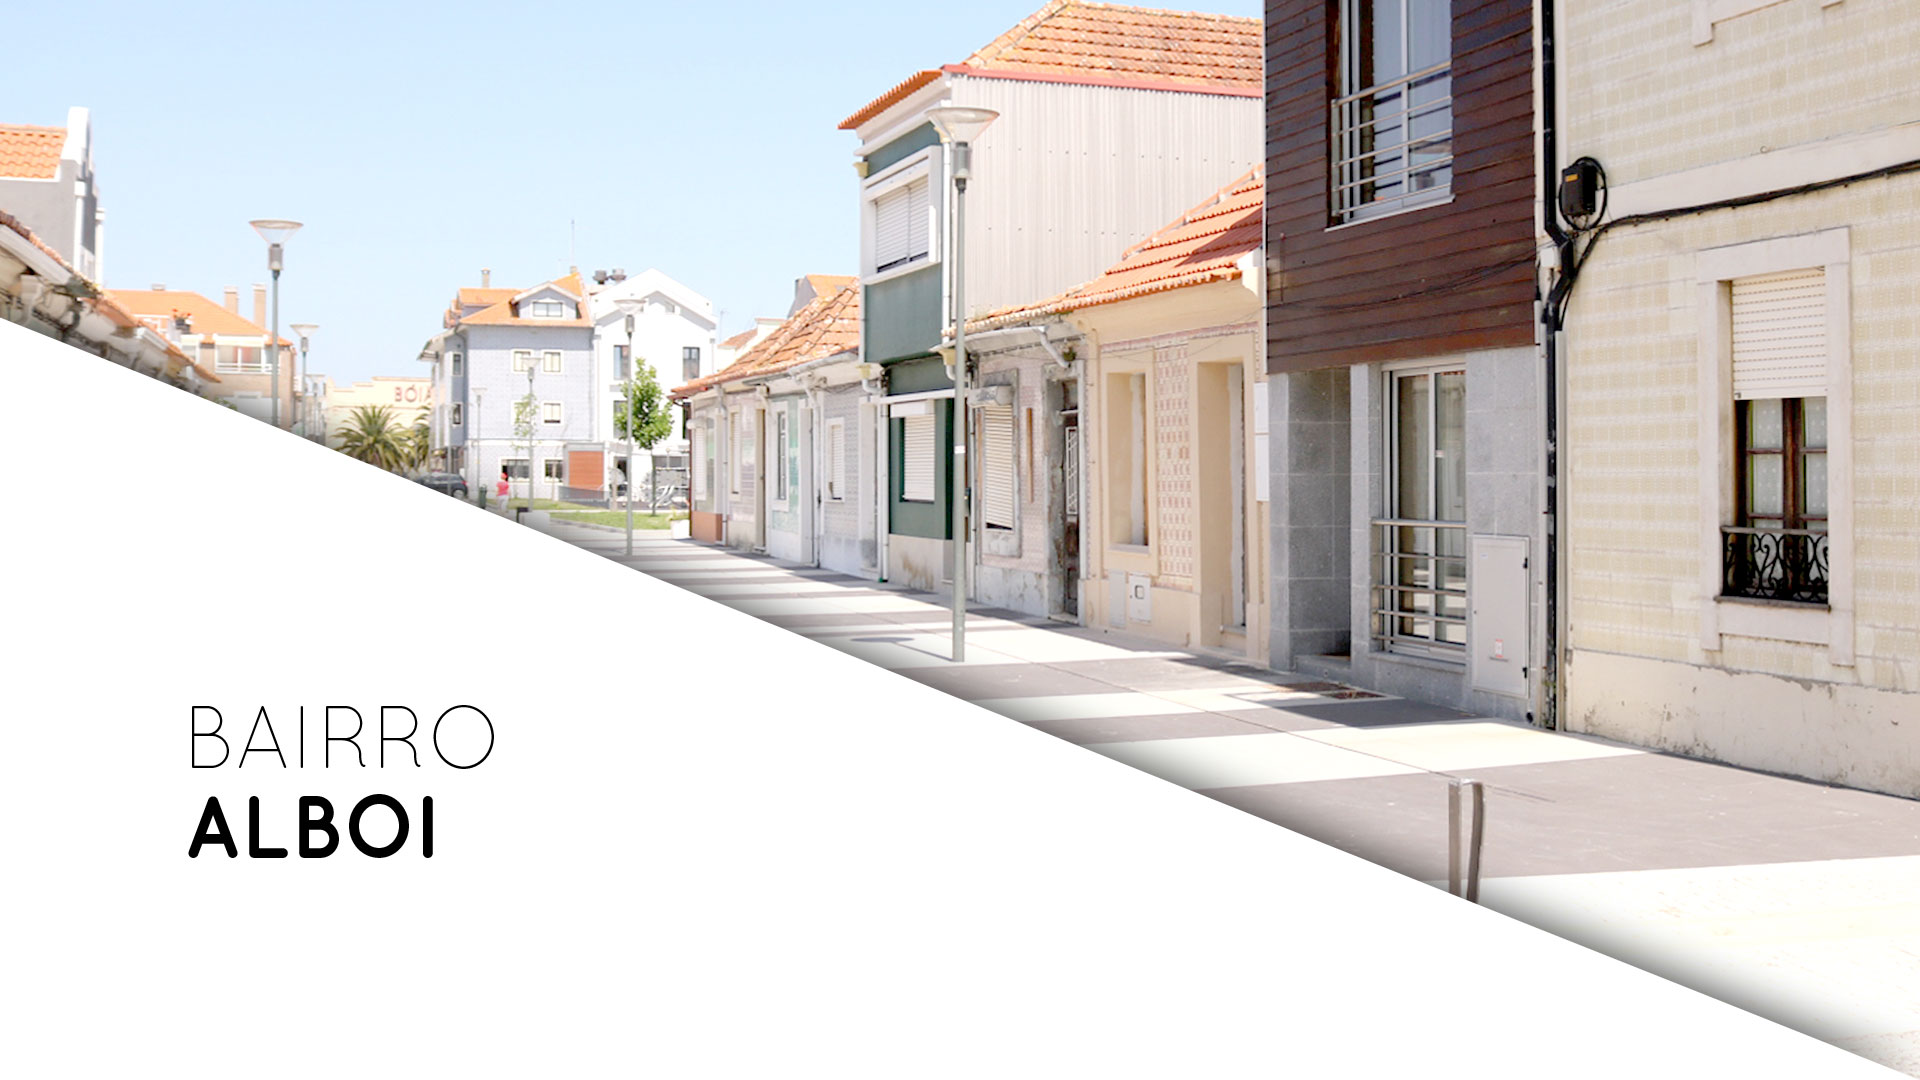 Alboi-Aveiro-ville-real-estate-imobiliaria-comprar-arrendar-vender-moradia-apartamento-casa-t0-t1-t2-t3-t4-capa-2